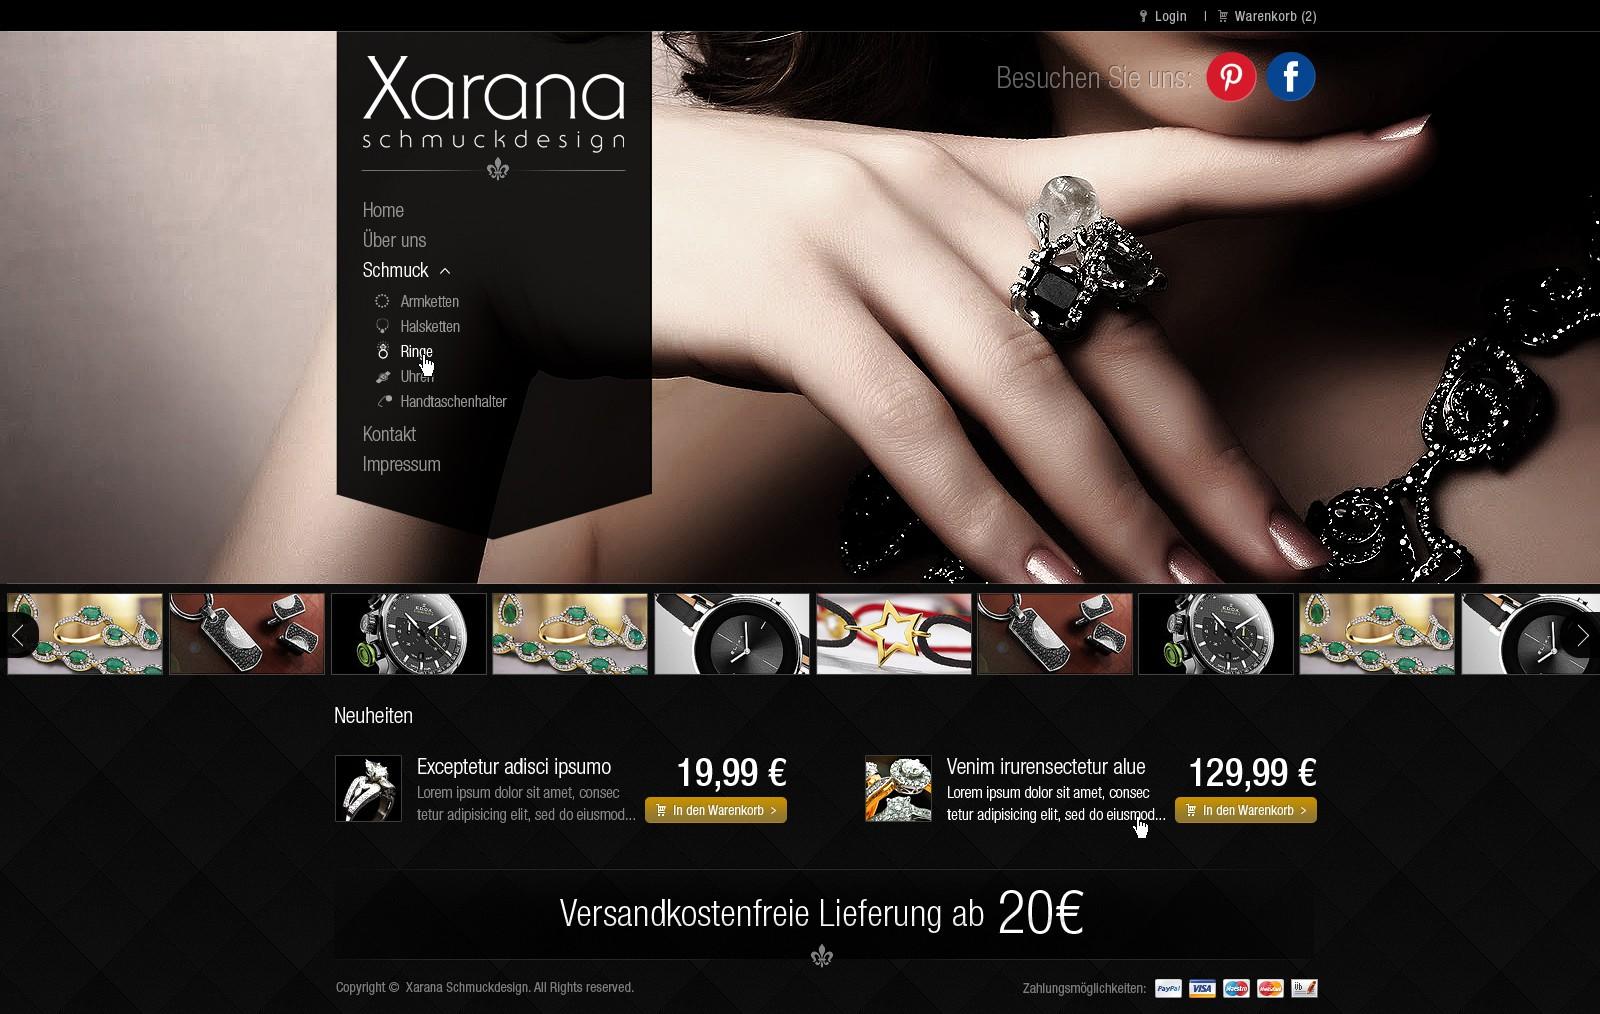 Help Xarana to a new website design!